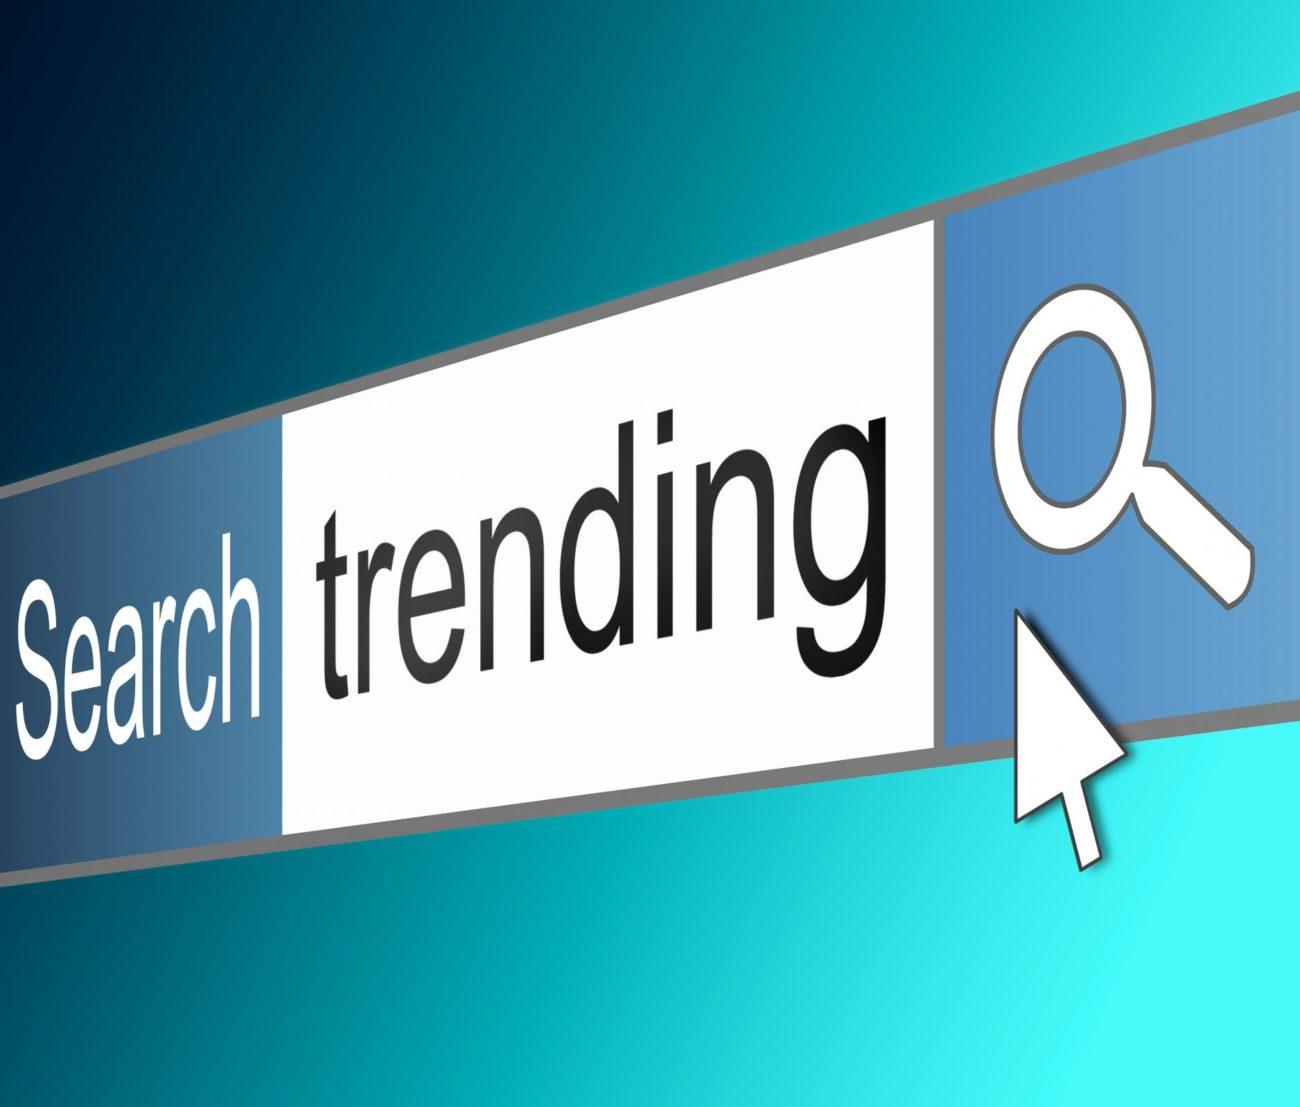 Trendy Topics 4u: Top 4 Trends Impacting B2B Sales Right Now